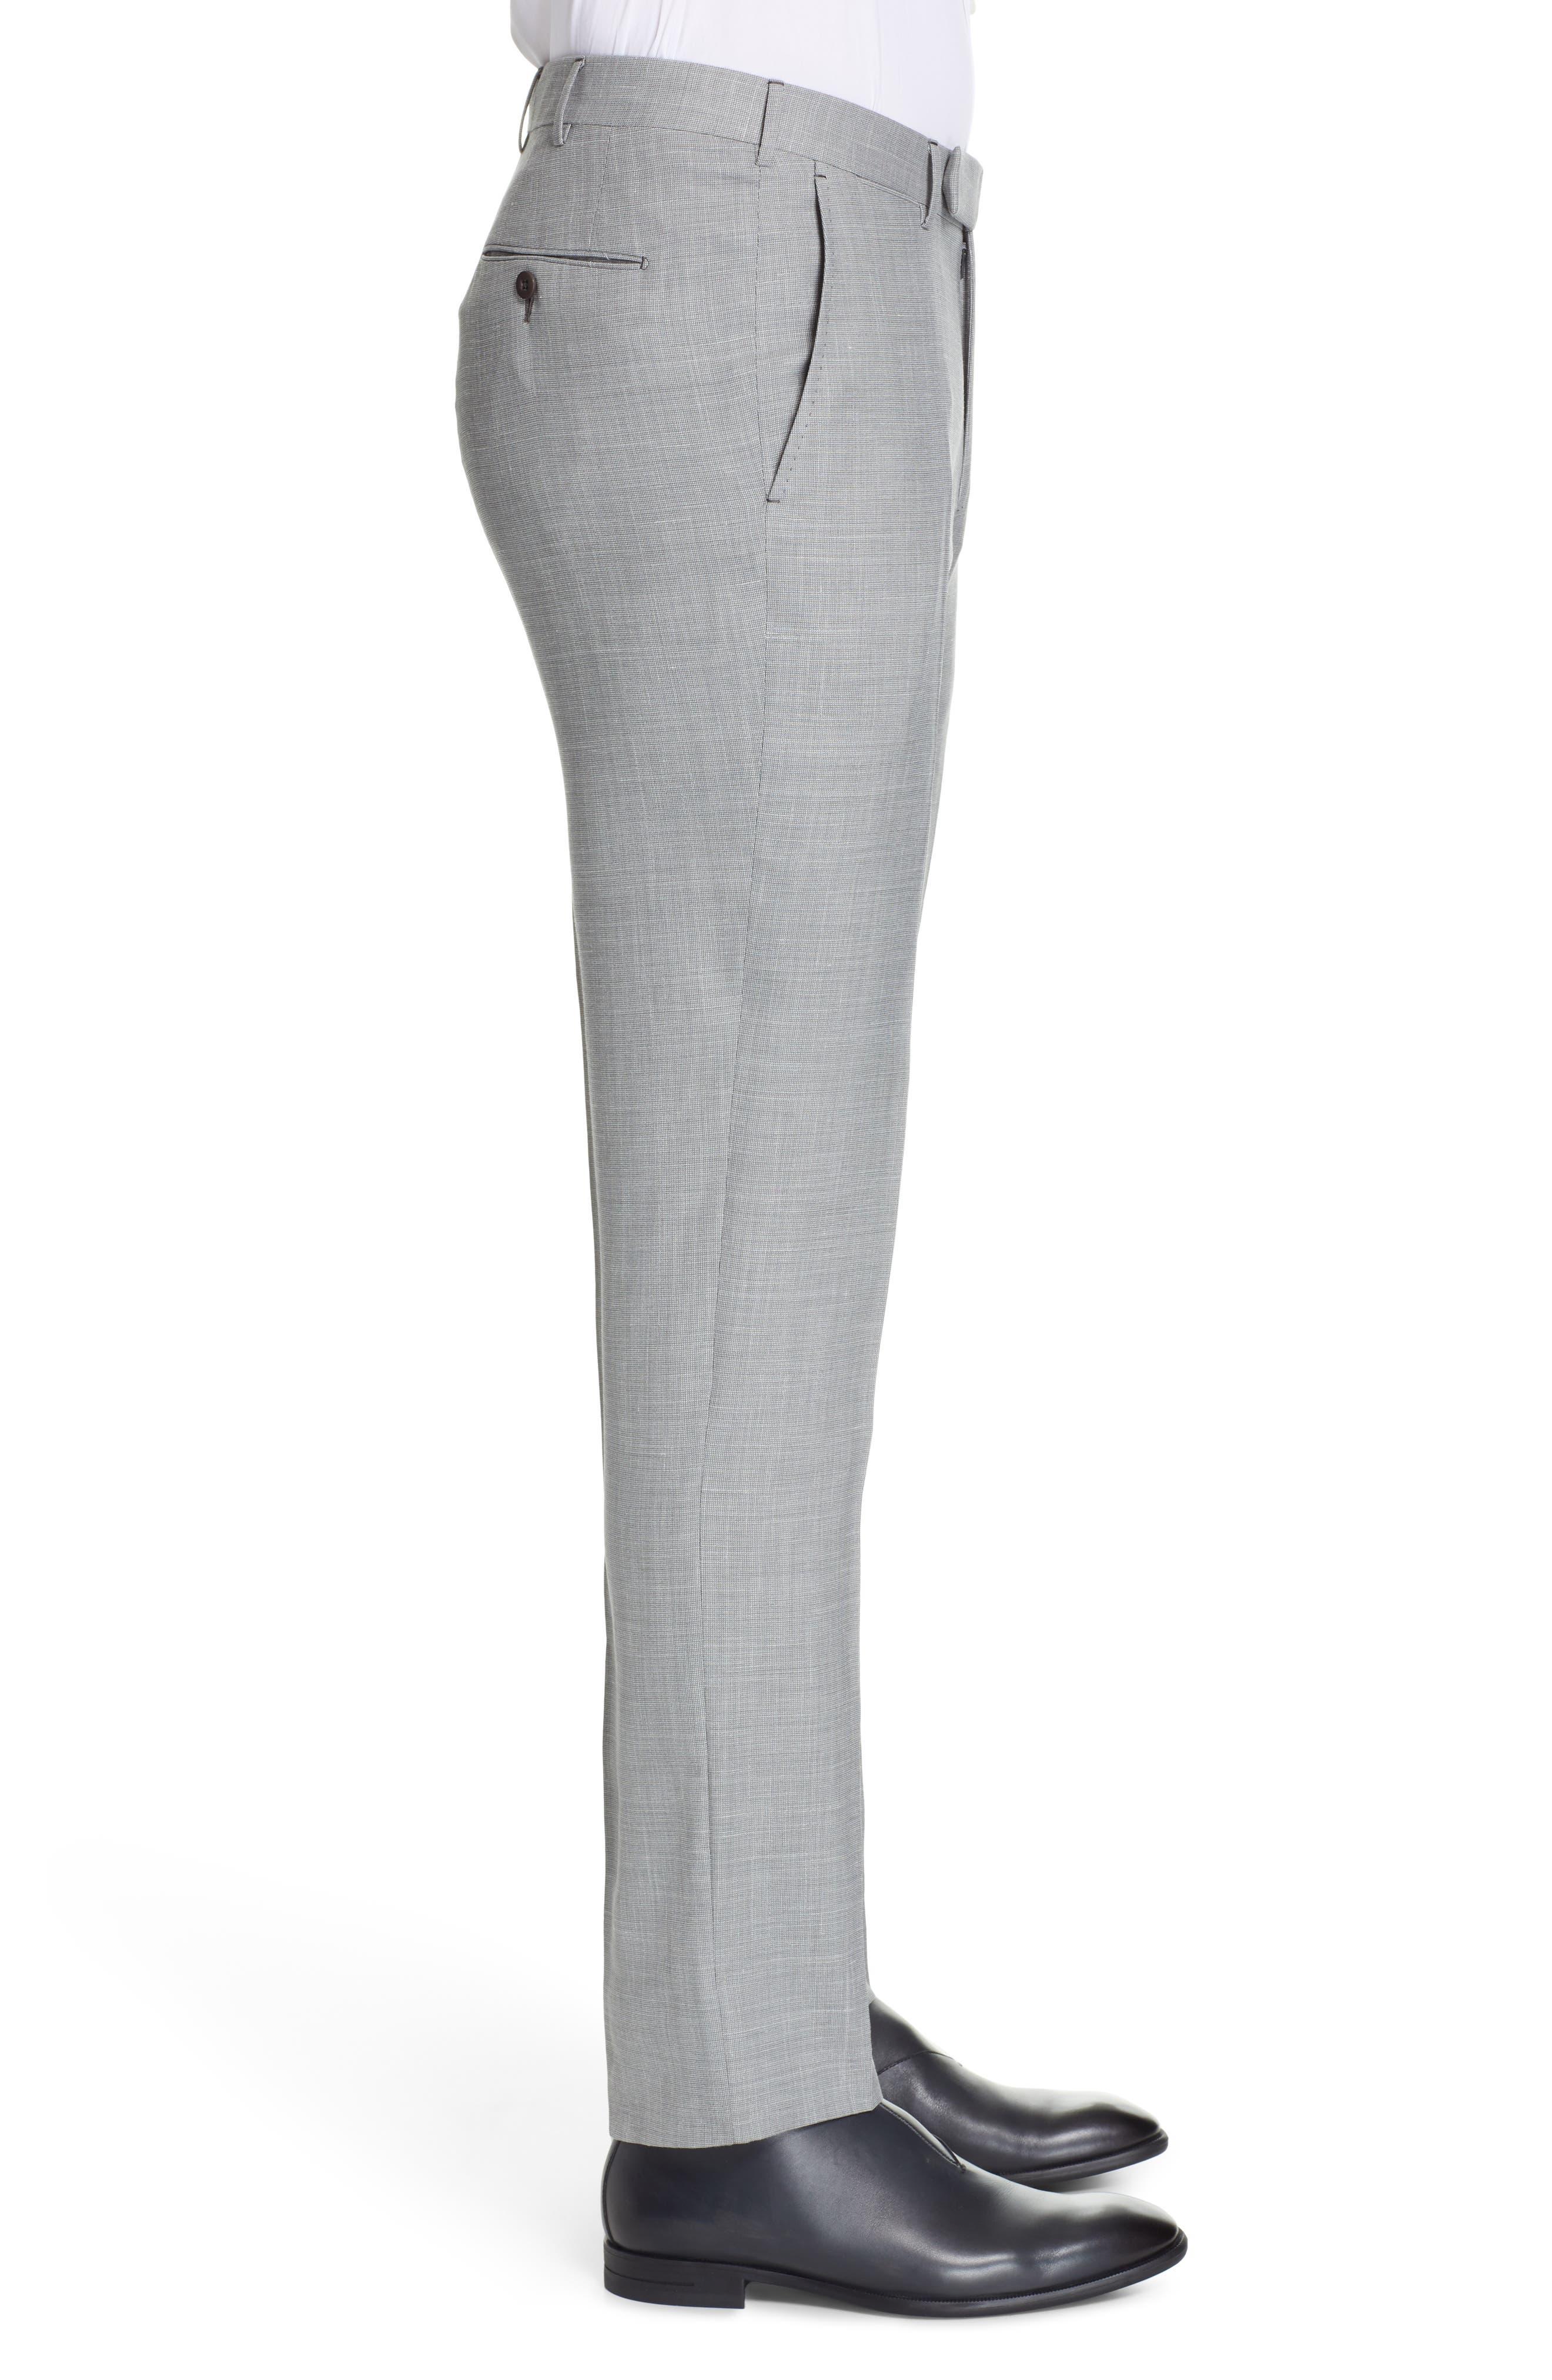 ERMENEGILDO ZEGNA, Trofeo Flat Front Solid Wool Blend Trousers, Alternate thumbnail 3, color, LIGHT GREY